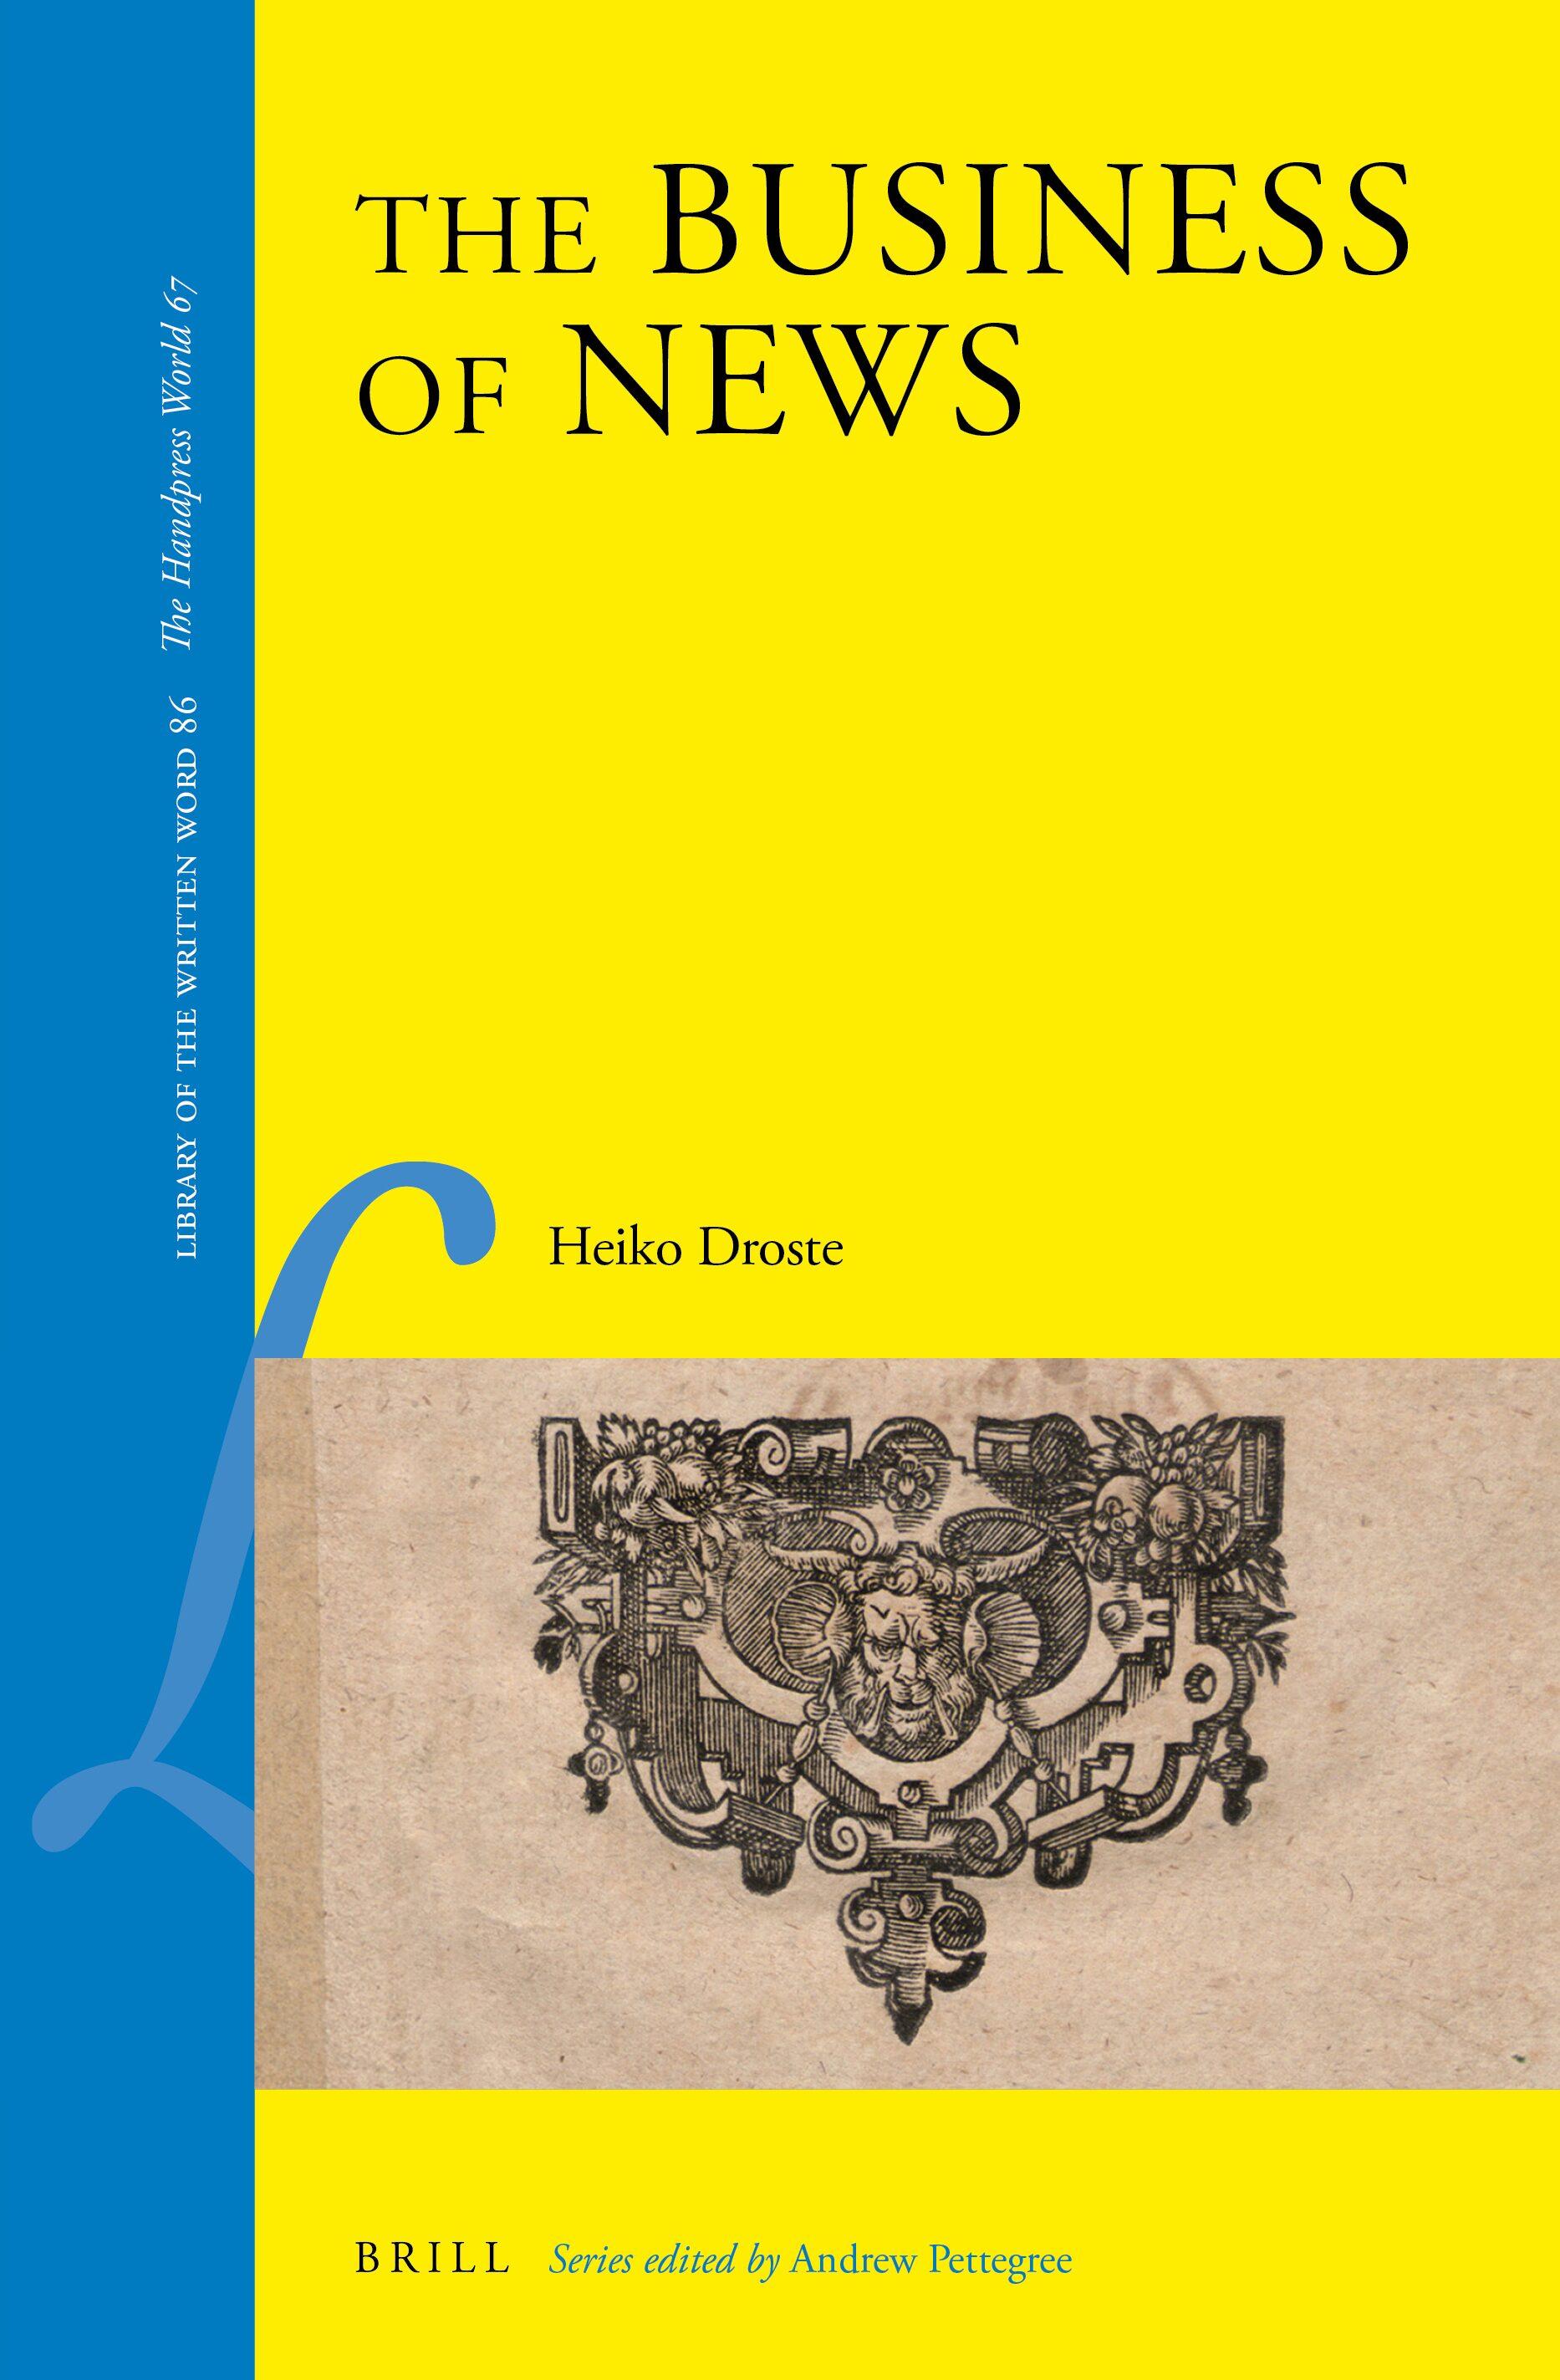 Geld monopoly europa edition documents.openideo.com: HASBRO